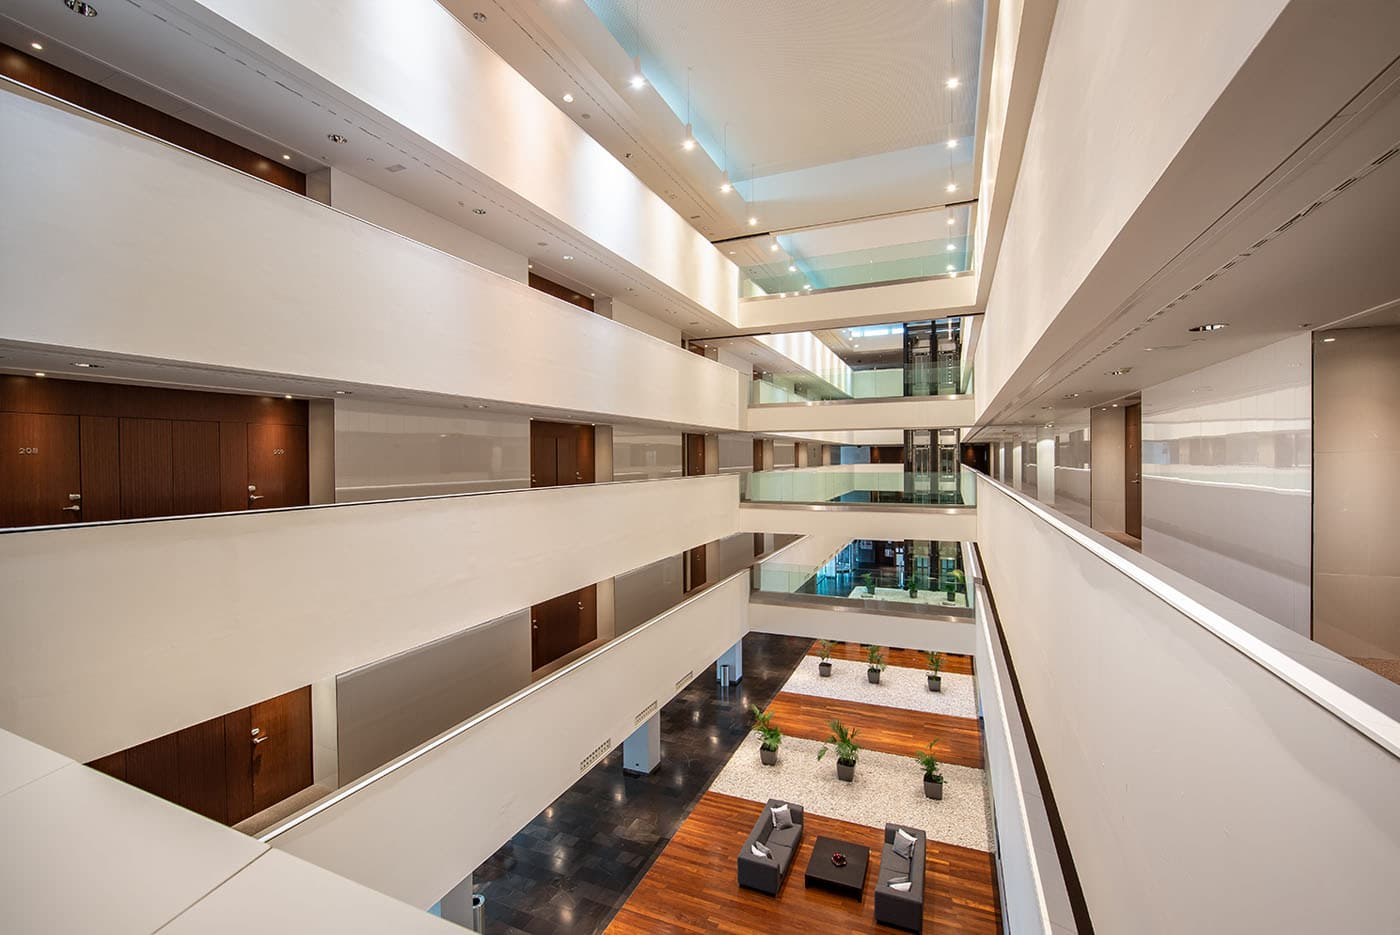 hotel-diagonal-plaza-adolfo-gosalvez-hoteles-panoramicos